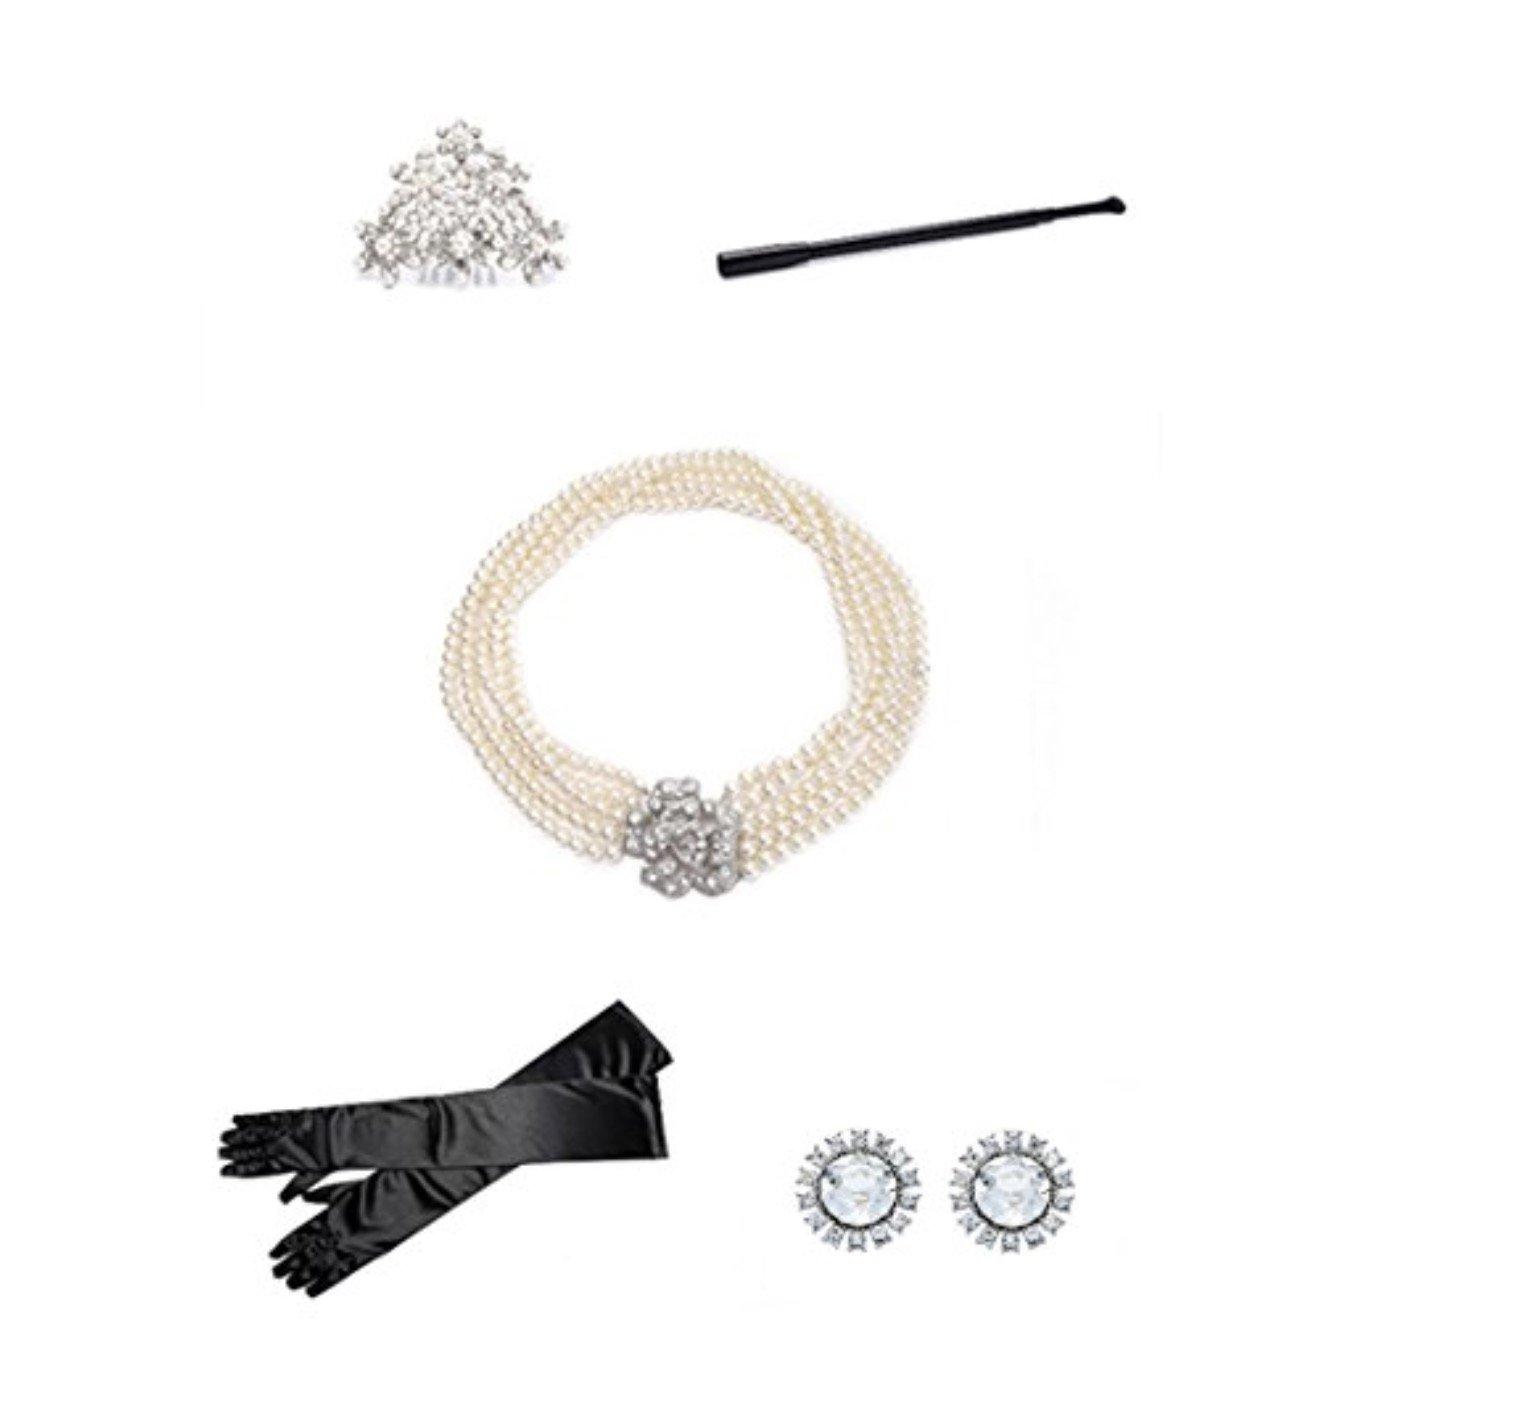 Utopiat Costume Jewelry and Accessory Set, Audrey Hepburn, Breakfast at Tiffany's by Utopiat (Image #2)